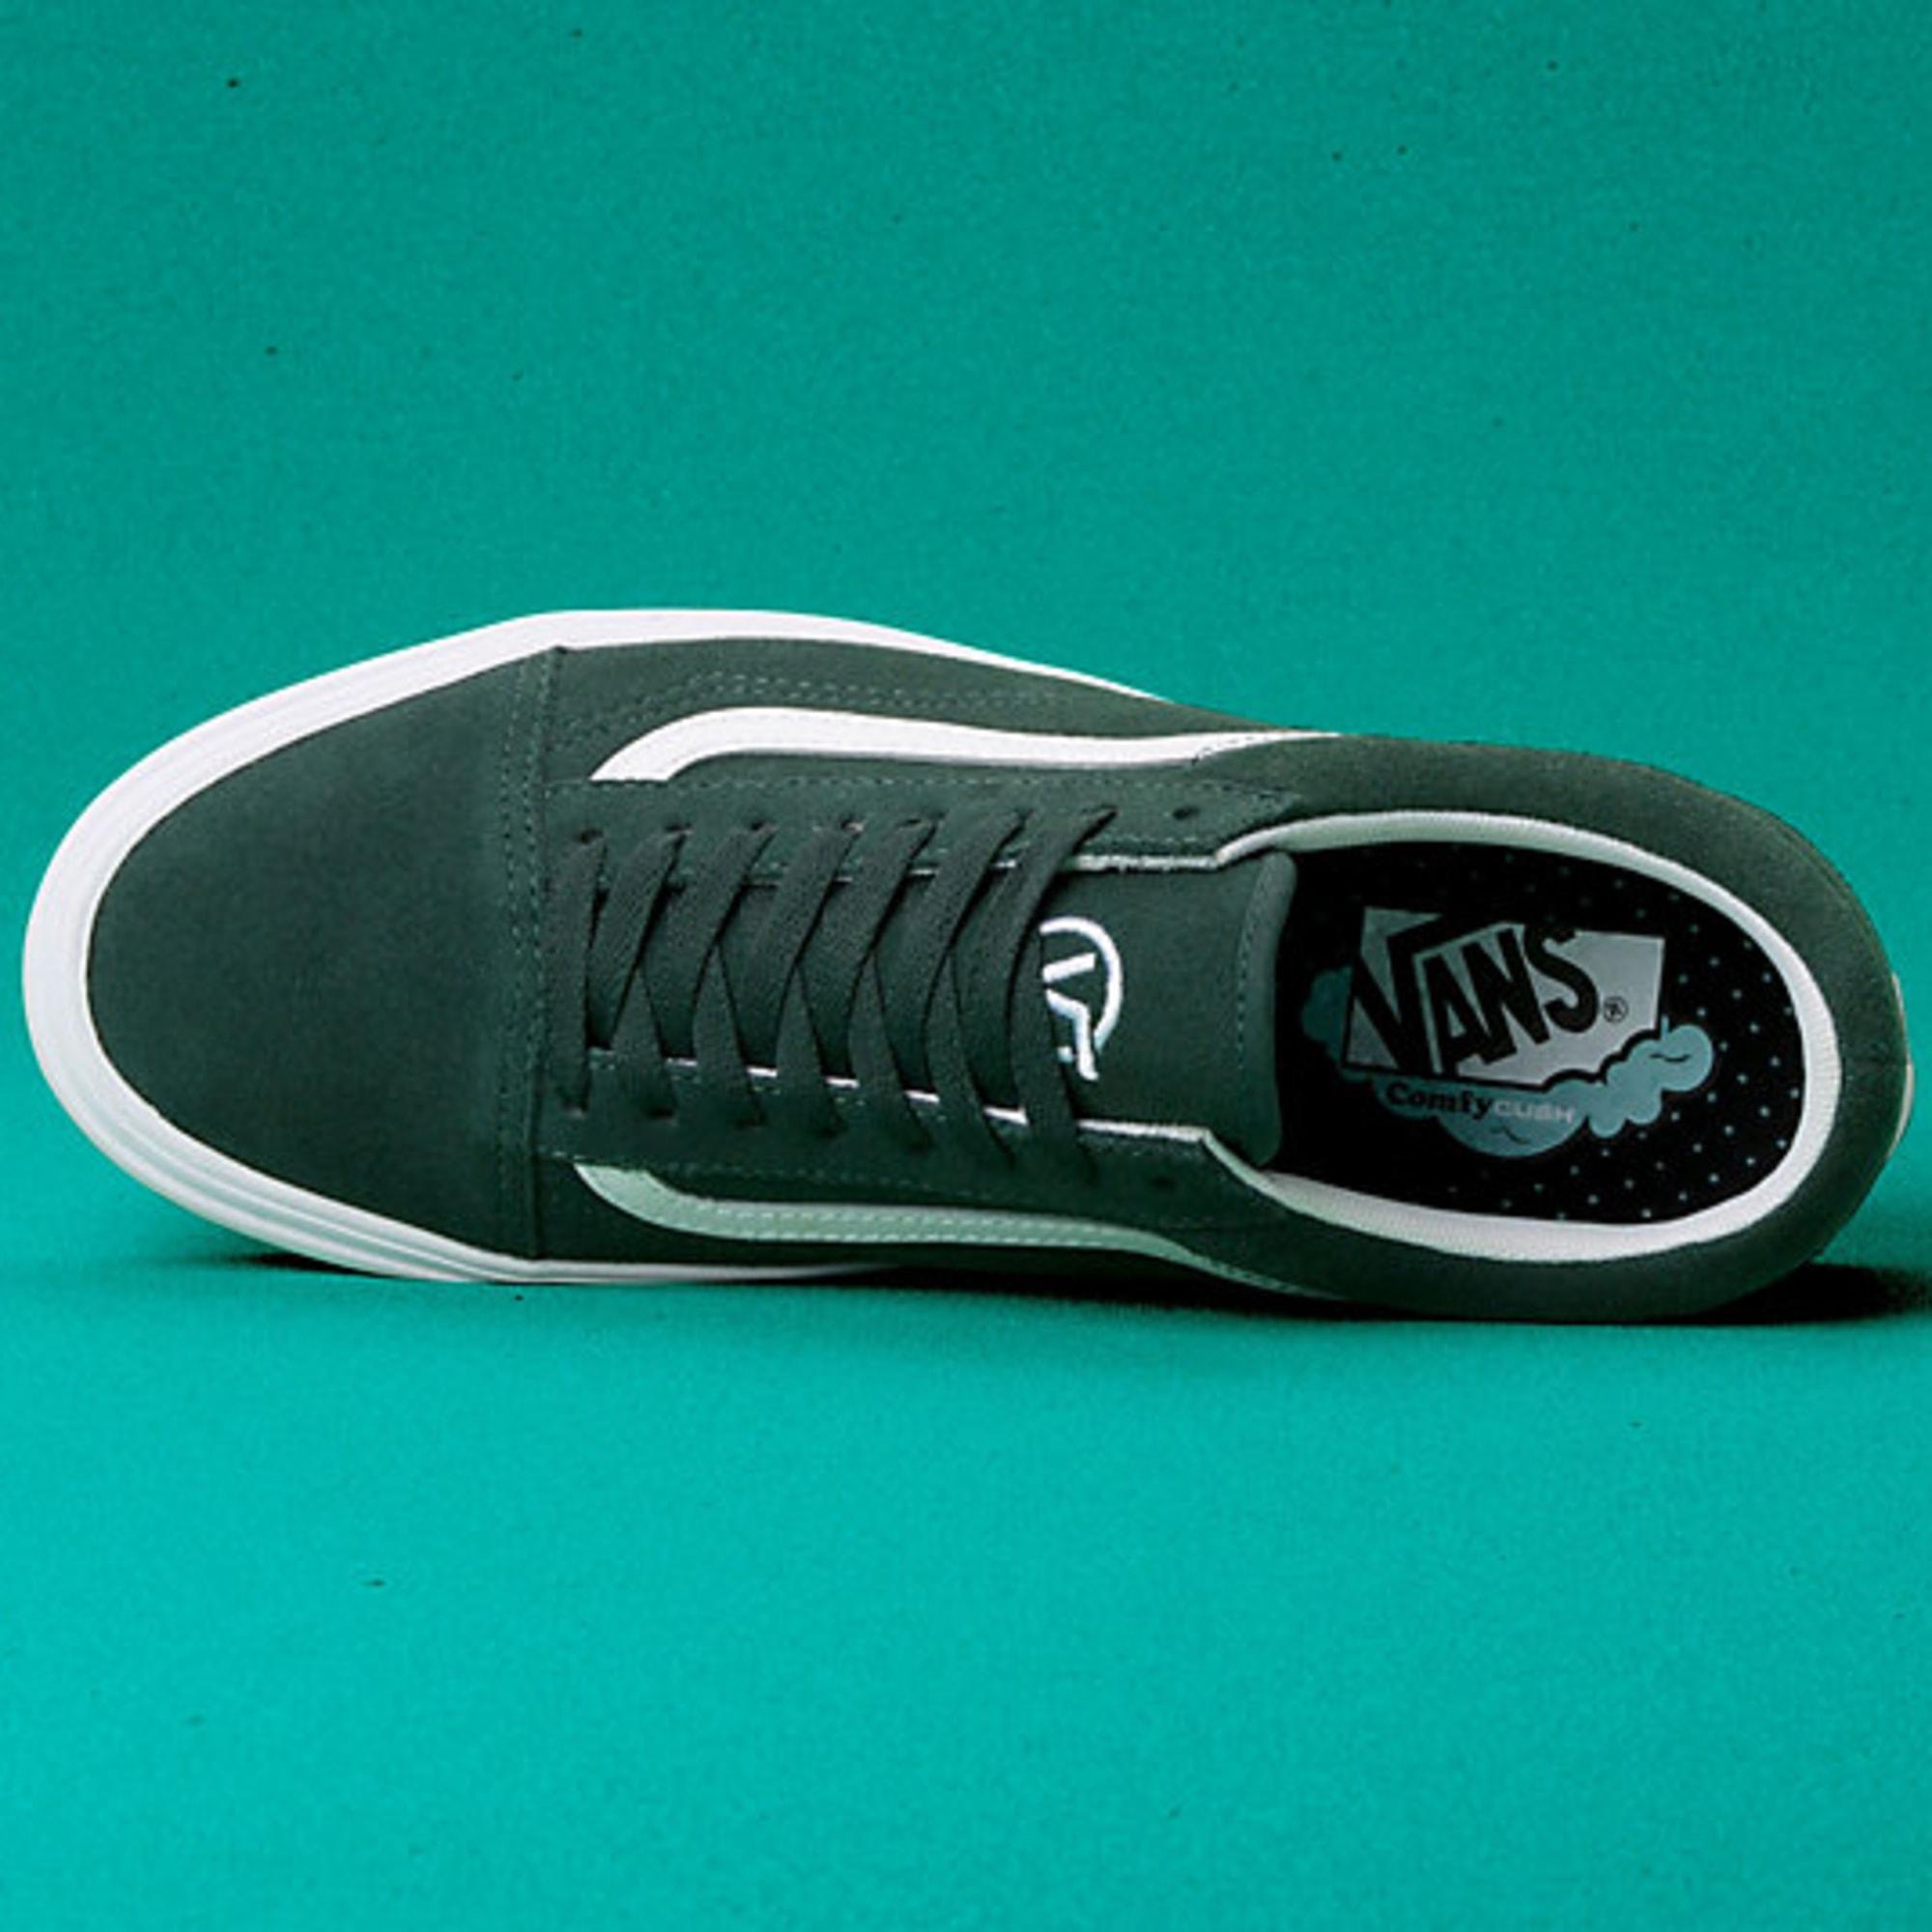 VANS Men's Distort Comfy Cush Old Skool Shoes